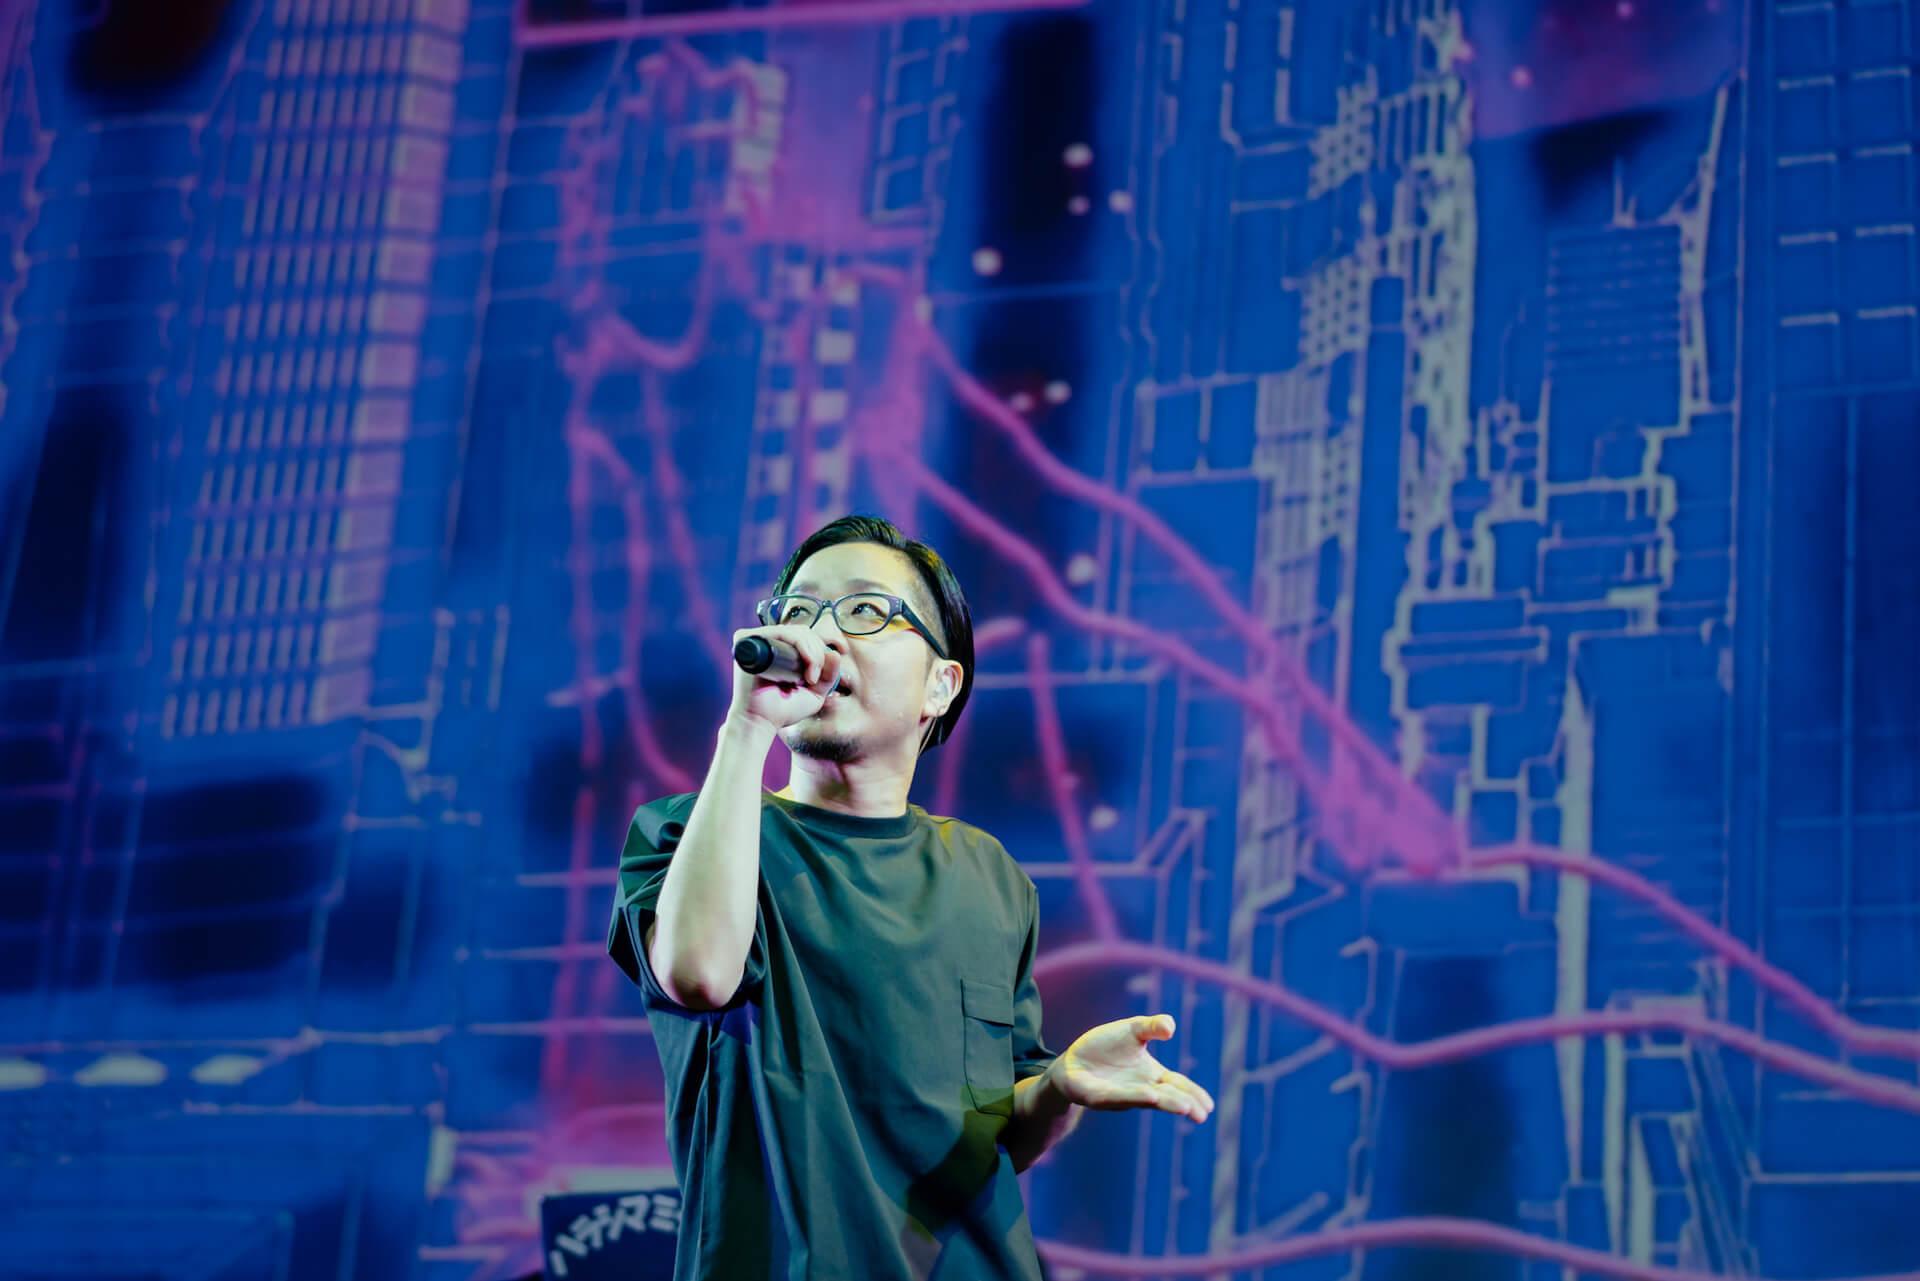 LIVEWIRE PUNPEE<Sofa Kingdomcome>のイースターエッグを一挙紹介! by みやーんZZ music200918_punpee_livewire_18